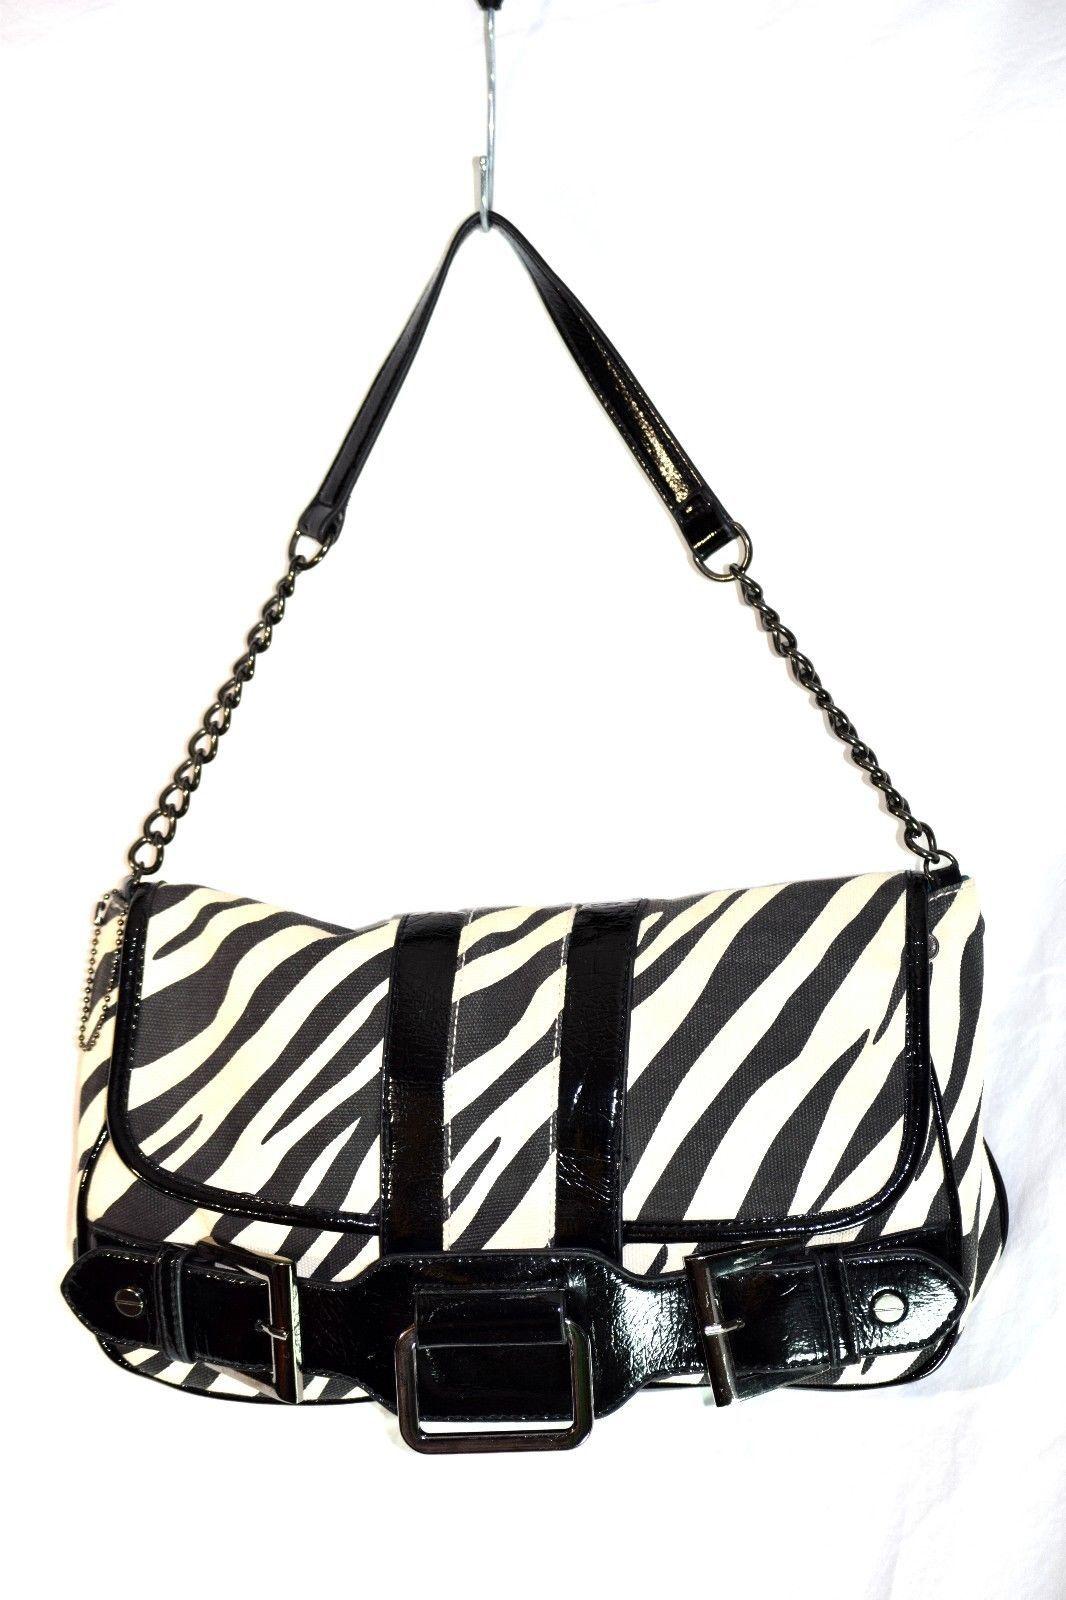 b7ced3a8e5 Steve Madden Zebra Print Purse Flap Top and 50 similar items